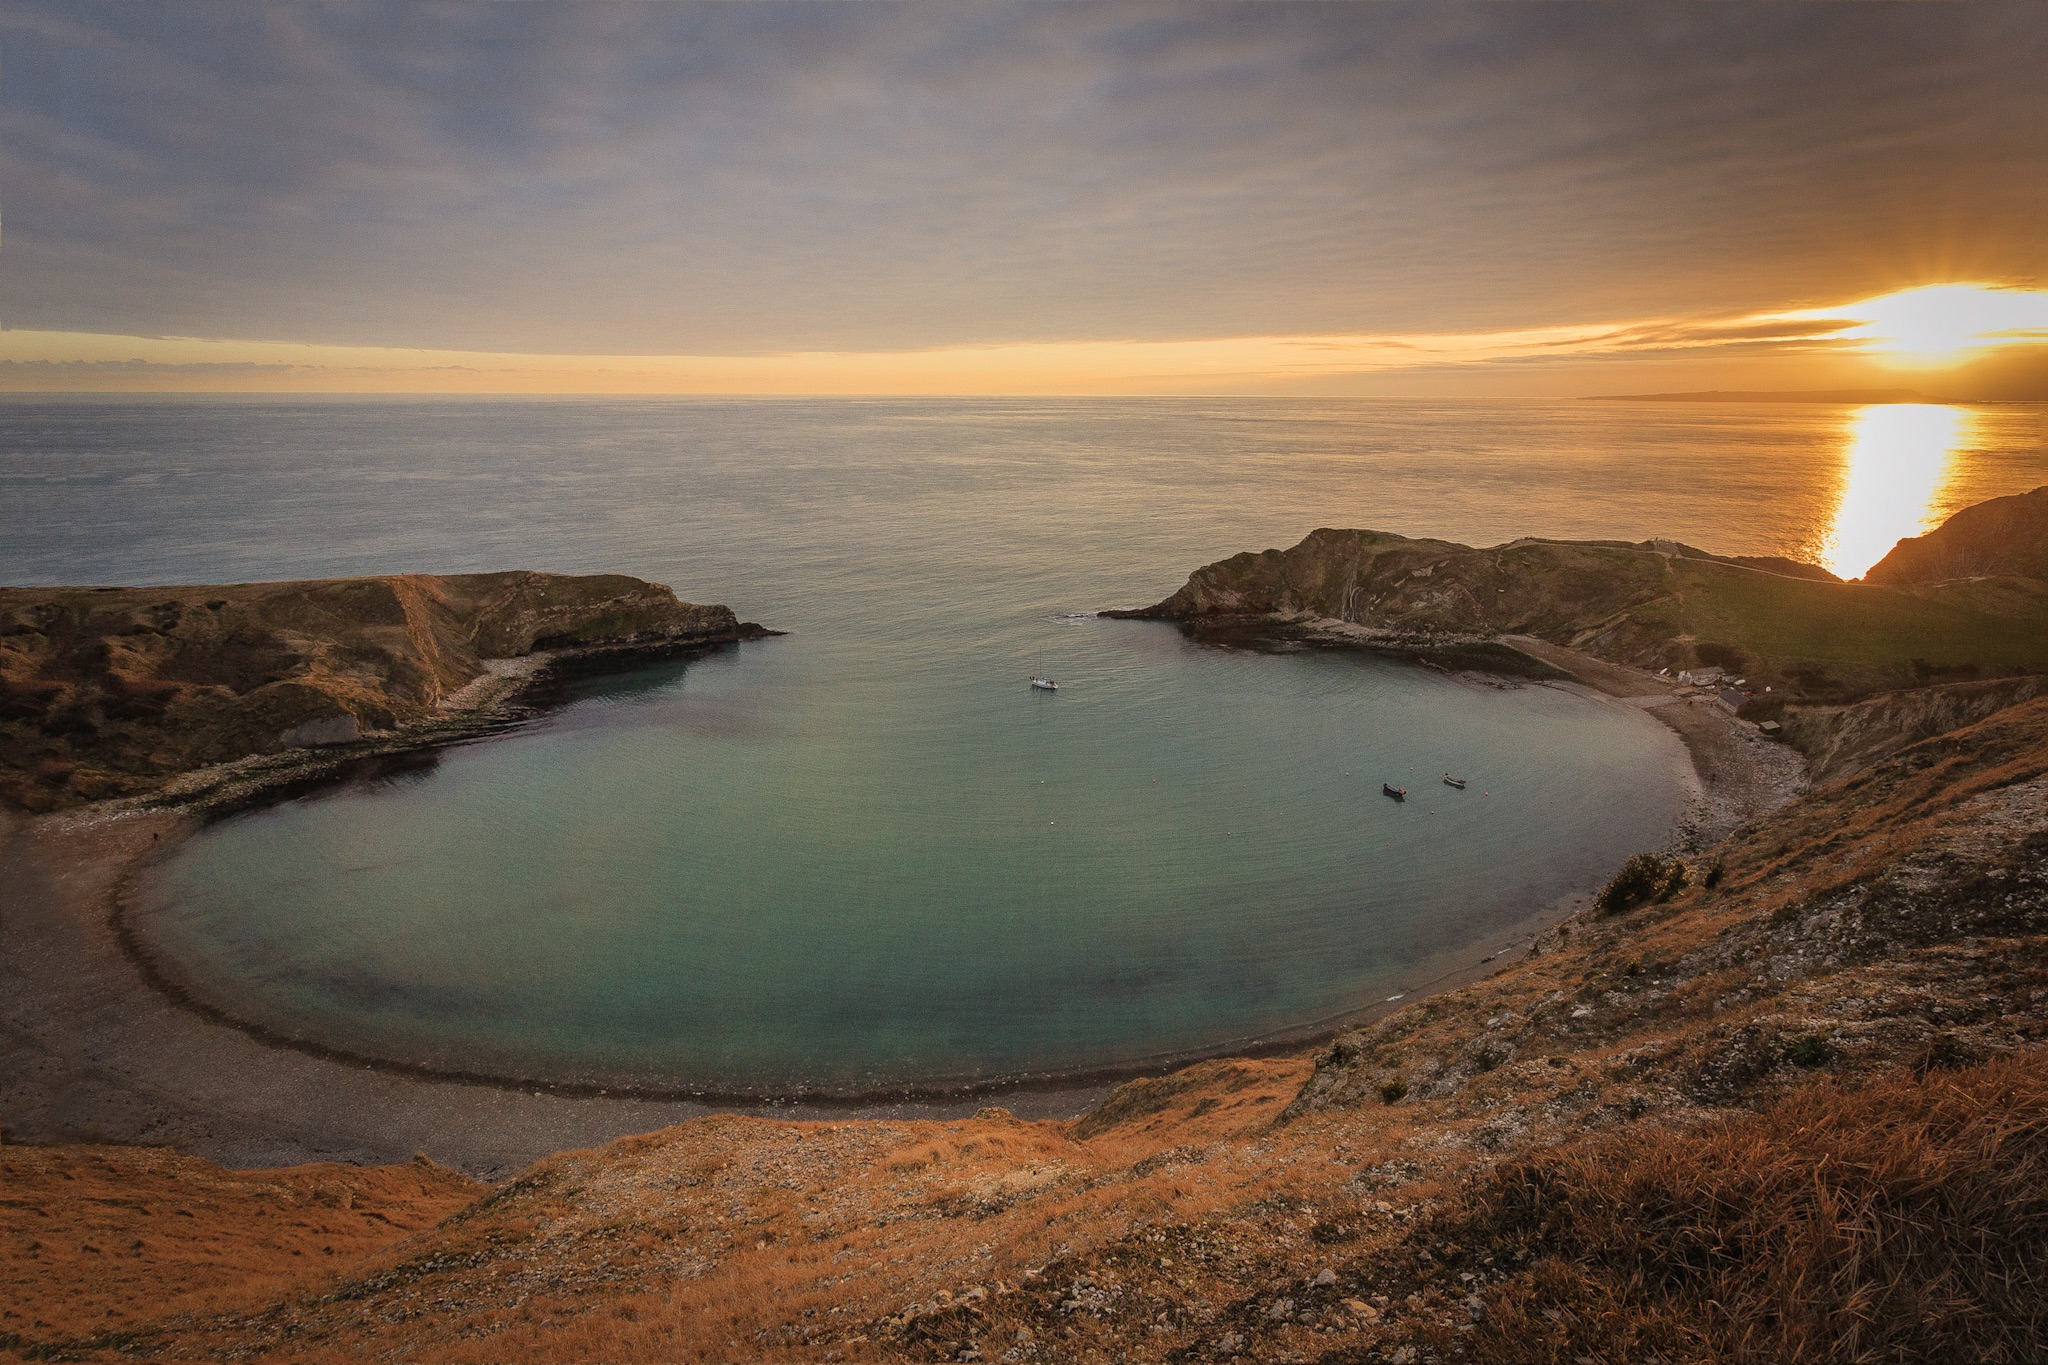 Lulworth Cove by Rick McEvoy